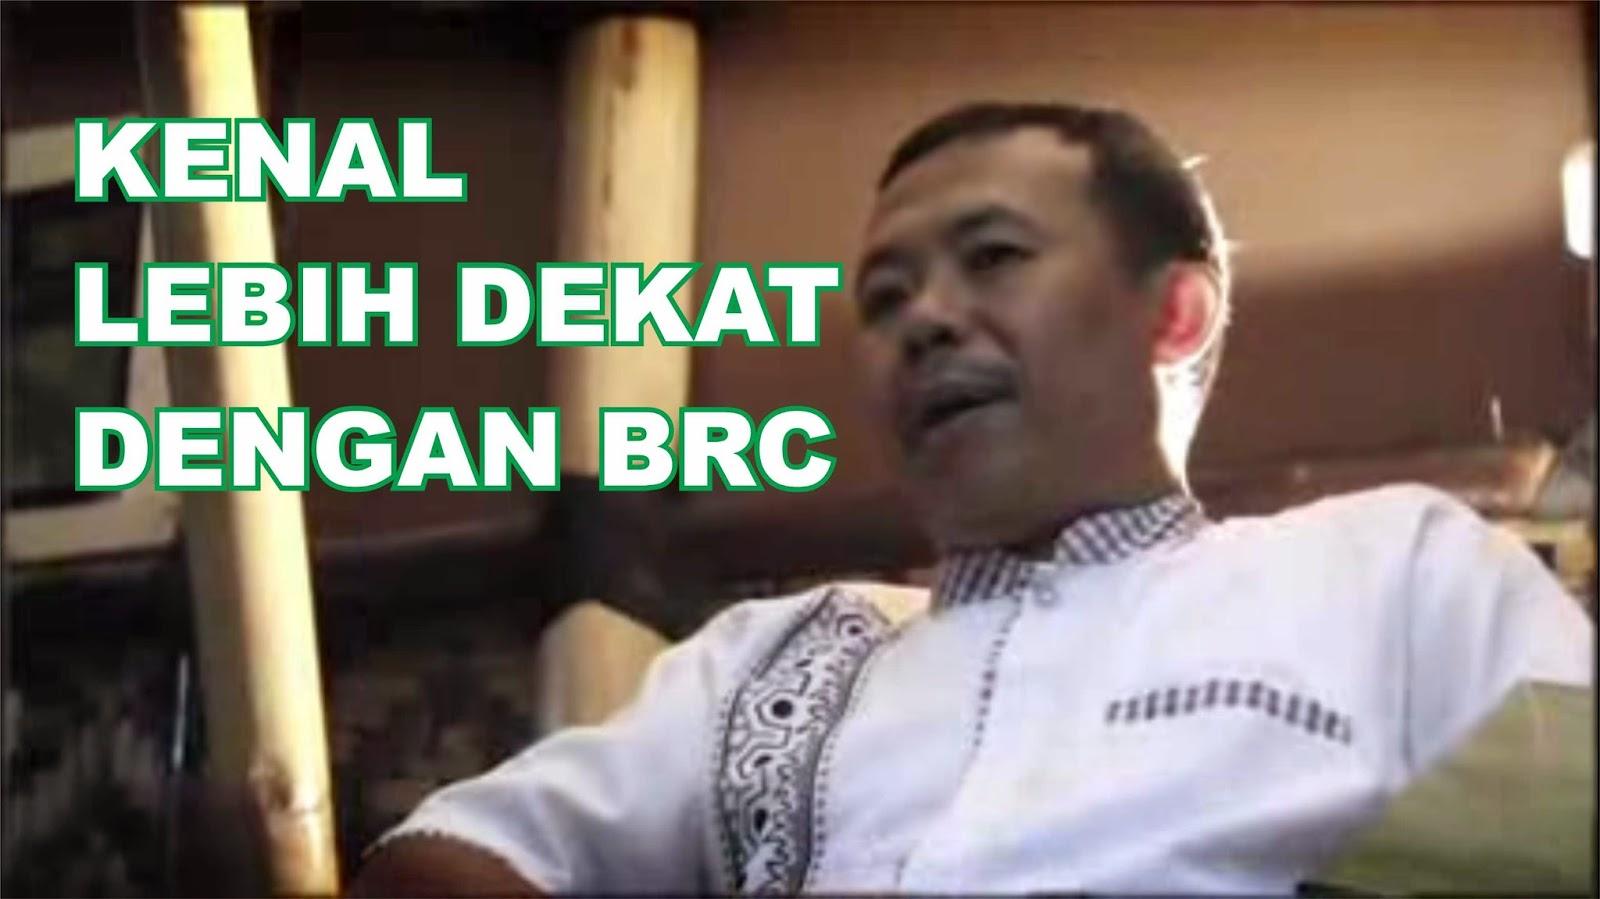 Alamat Kontak Telepon Rumah HP Handphone Klinik Bekam Ruqyah Center Cirebon